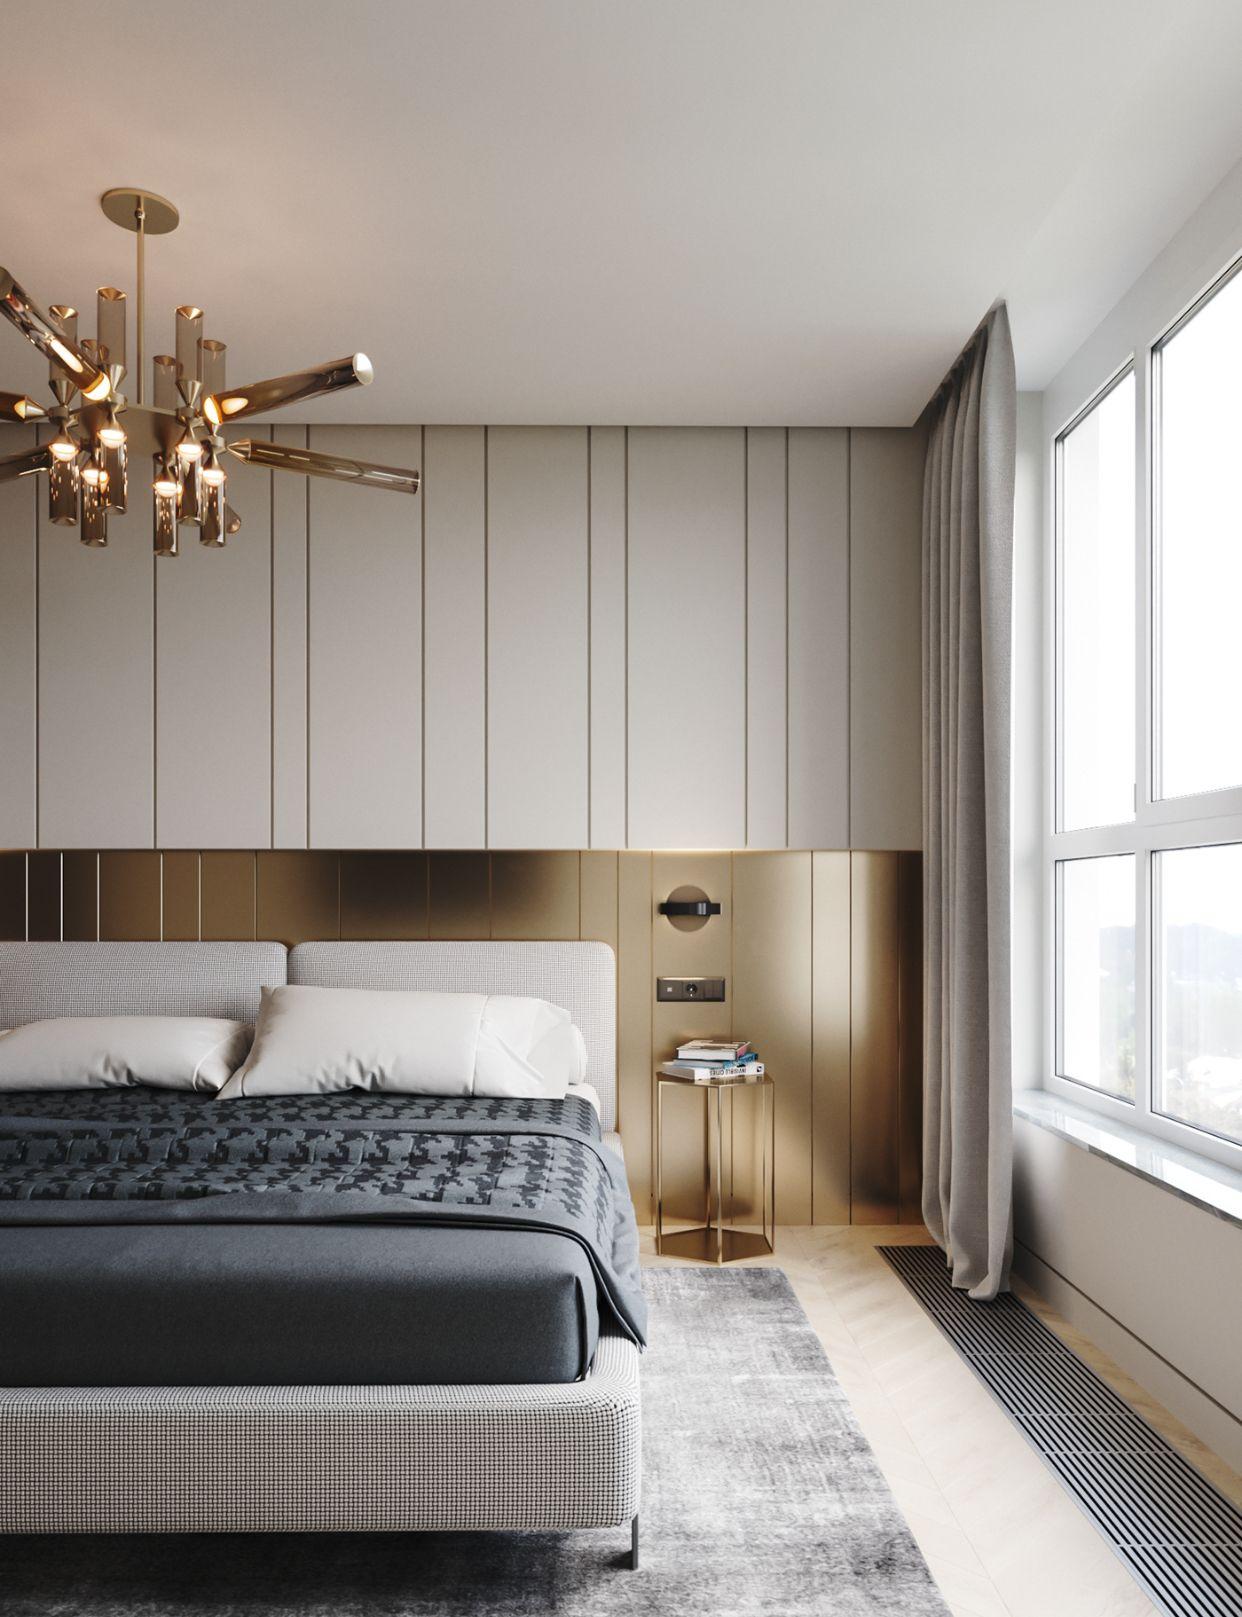 Contemporary Bedroom Interior Design: Interior Design In 2019